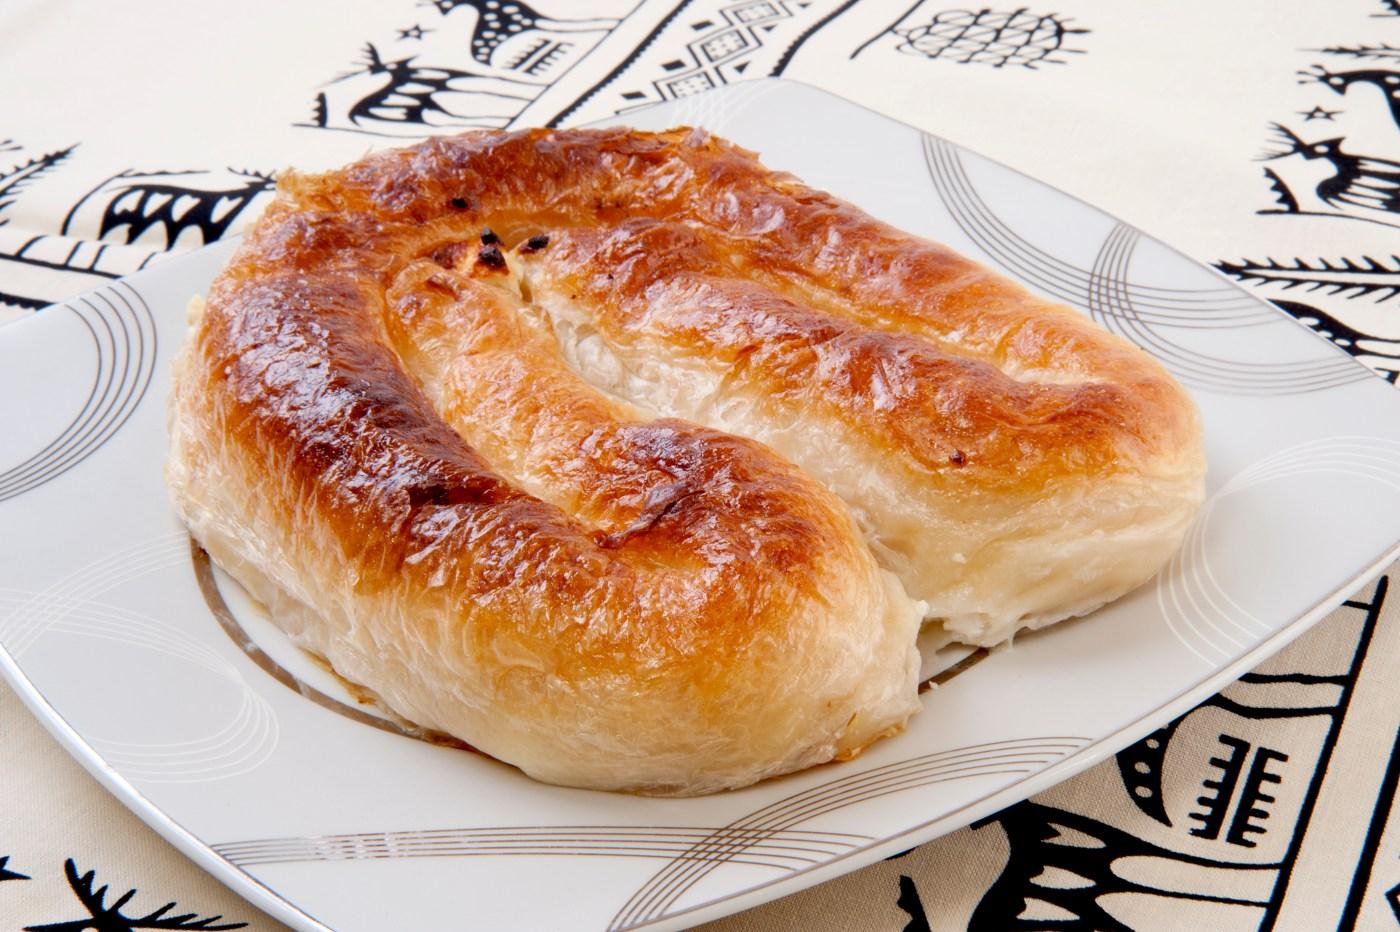 Filled pastry. burek